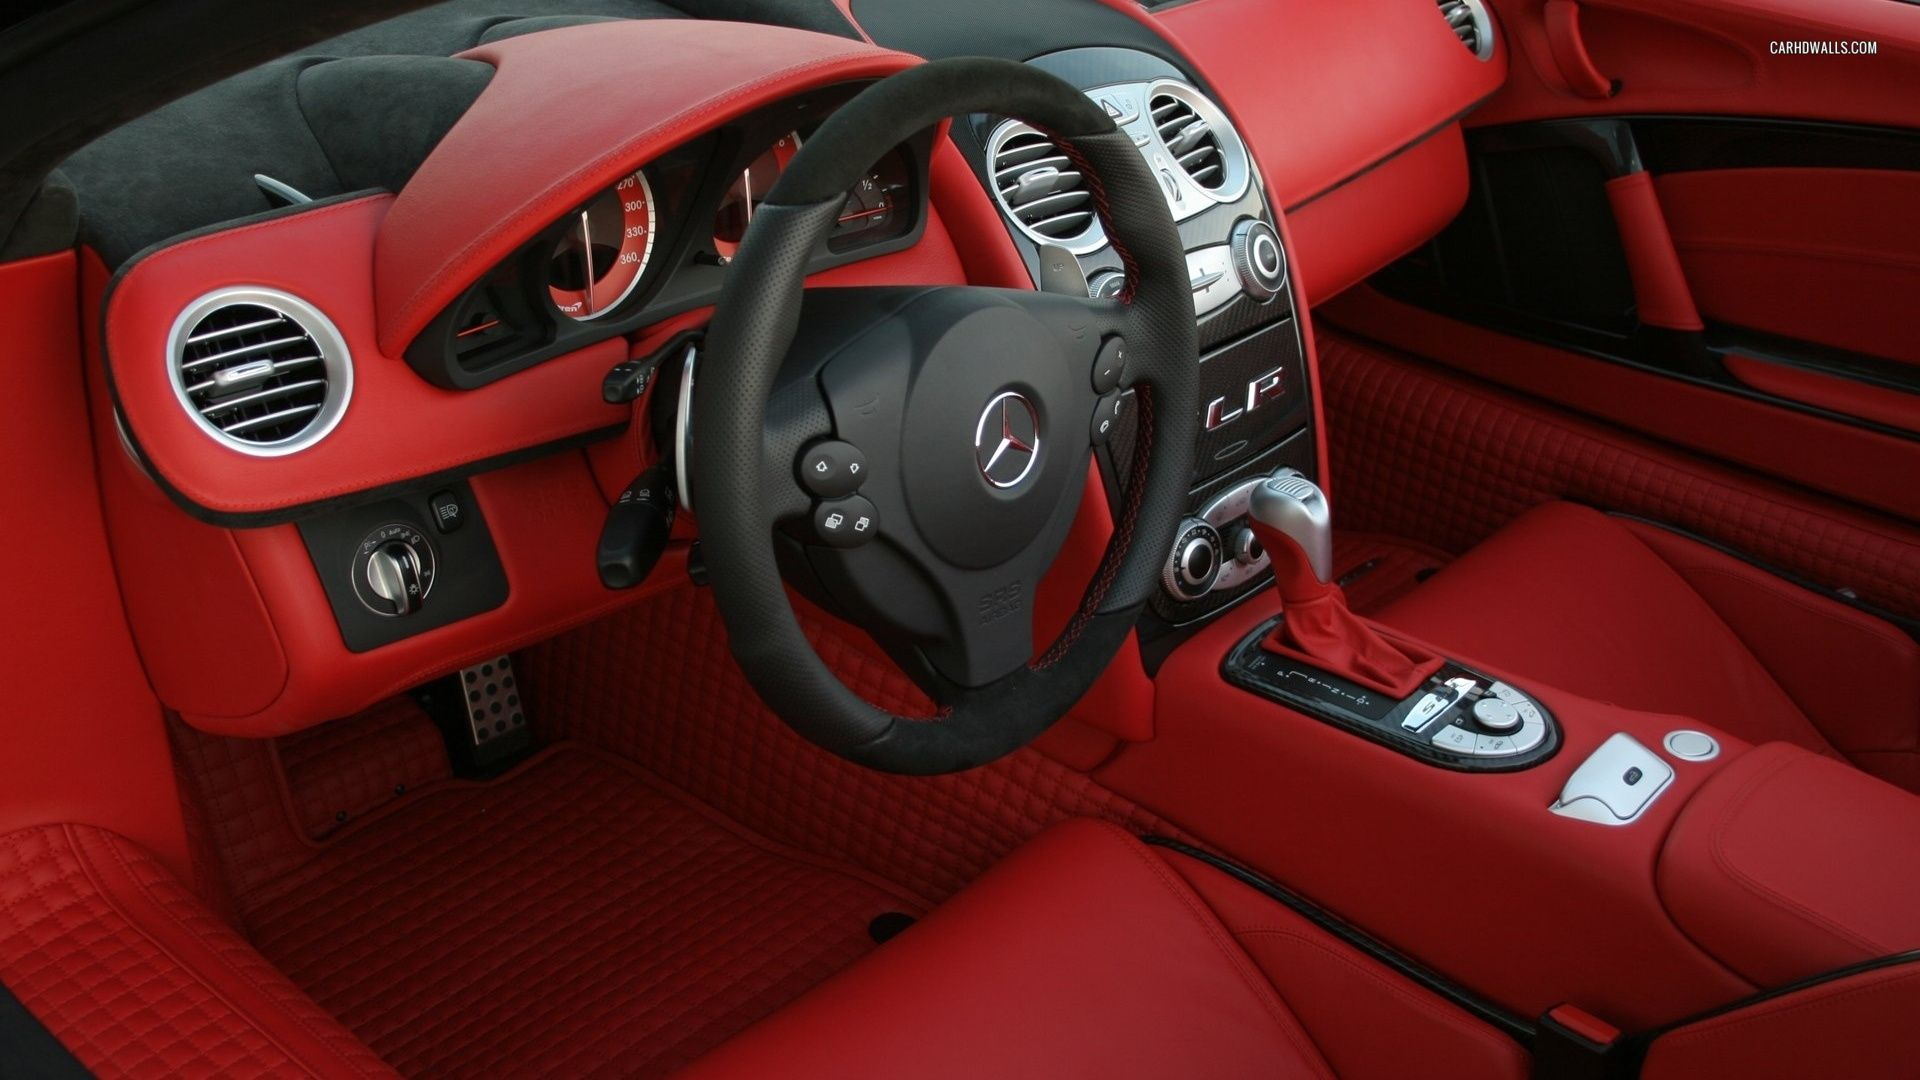 Image Result For Mercedes Slr Mclaren Interior Slr Mclaren